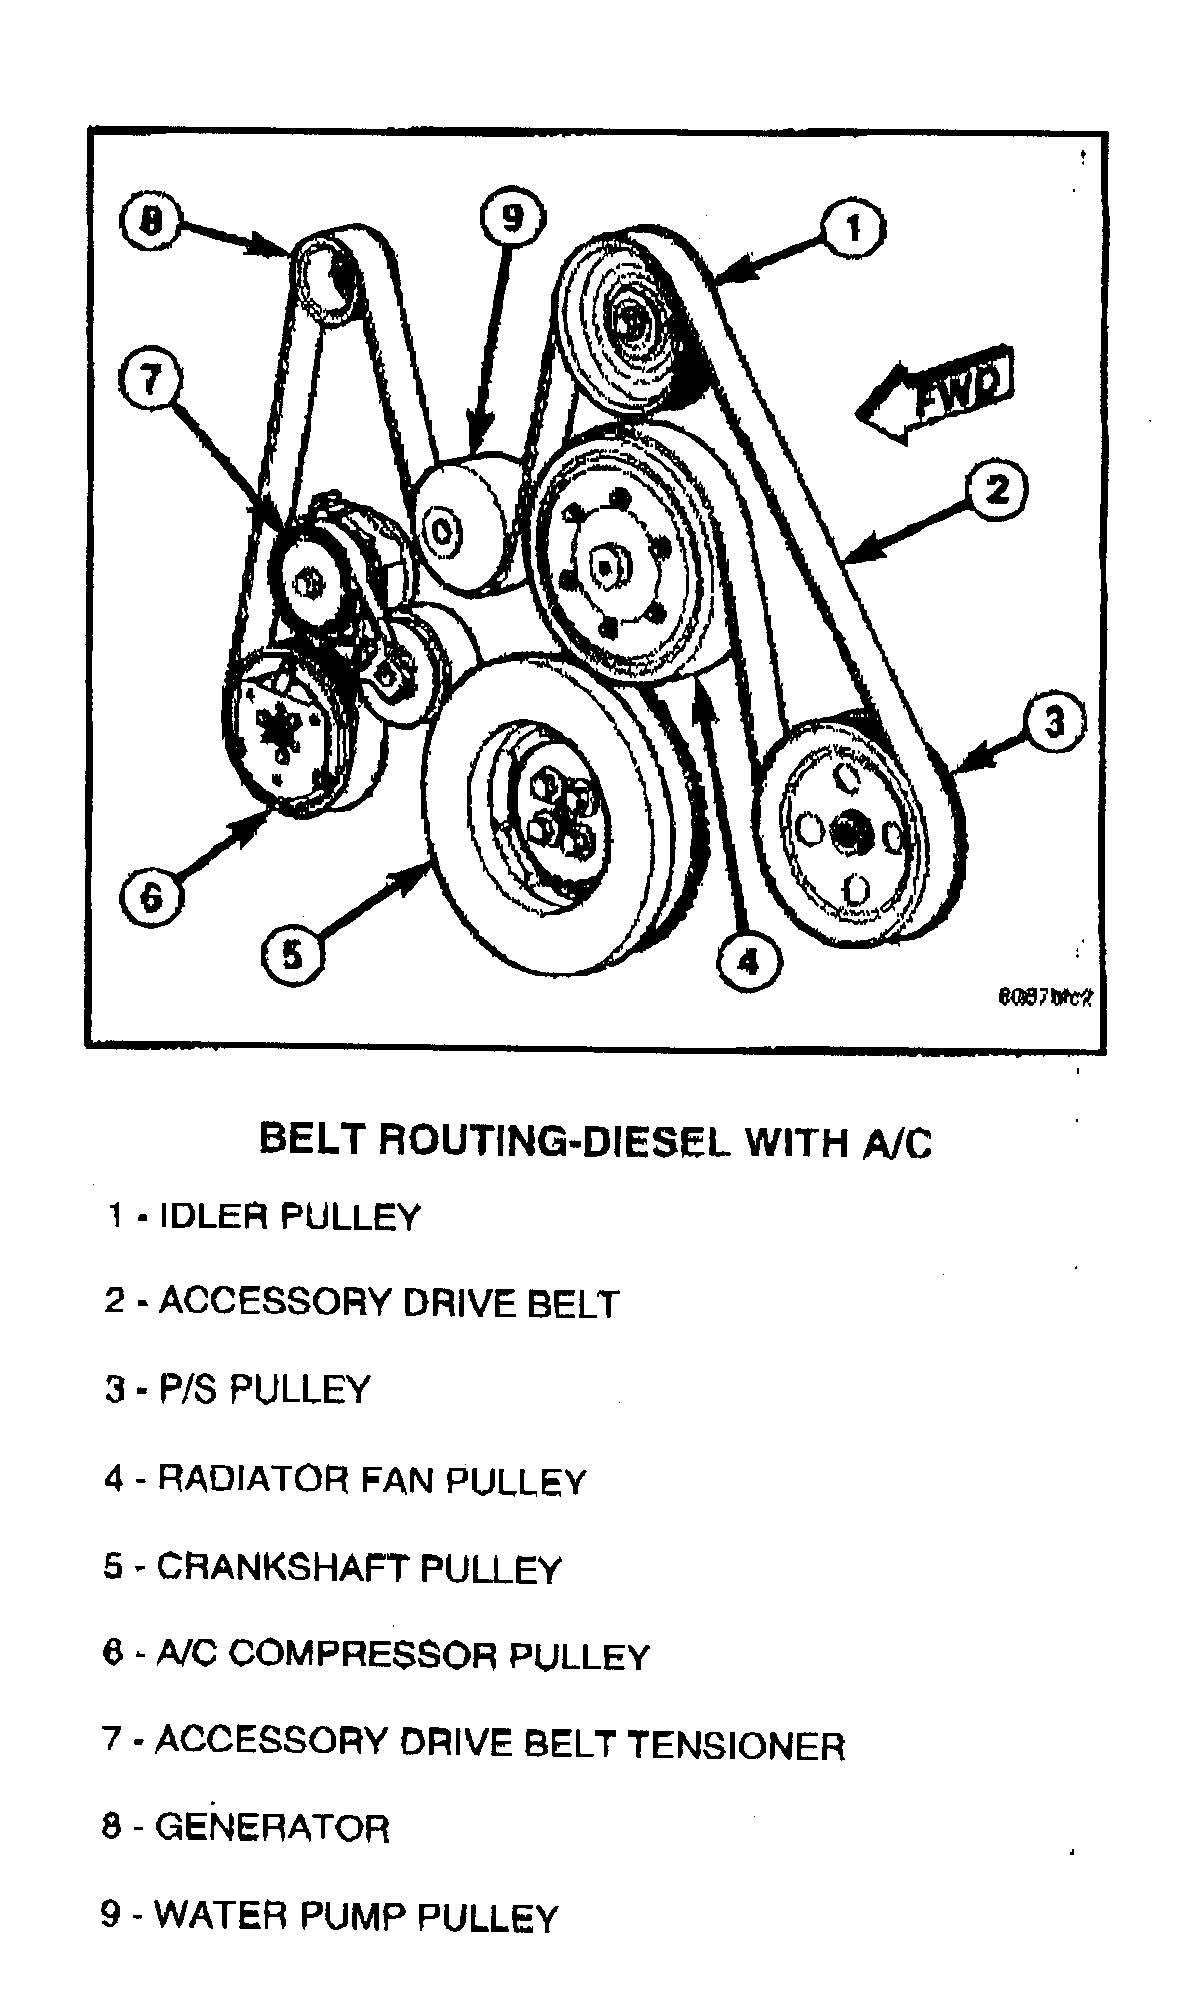 Jeep Patriot Serpentine Belt Diagram